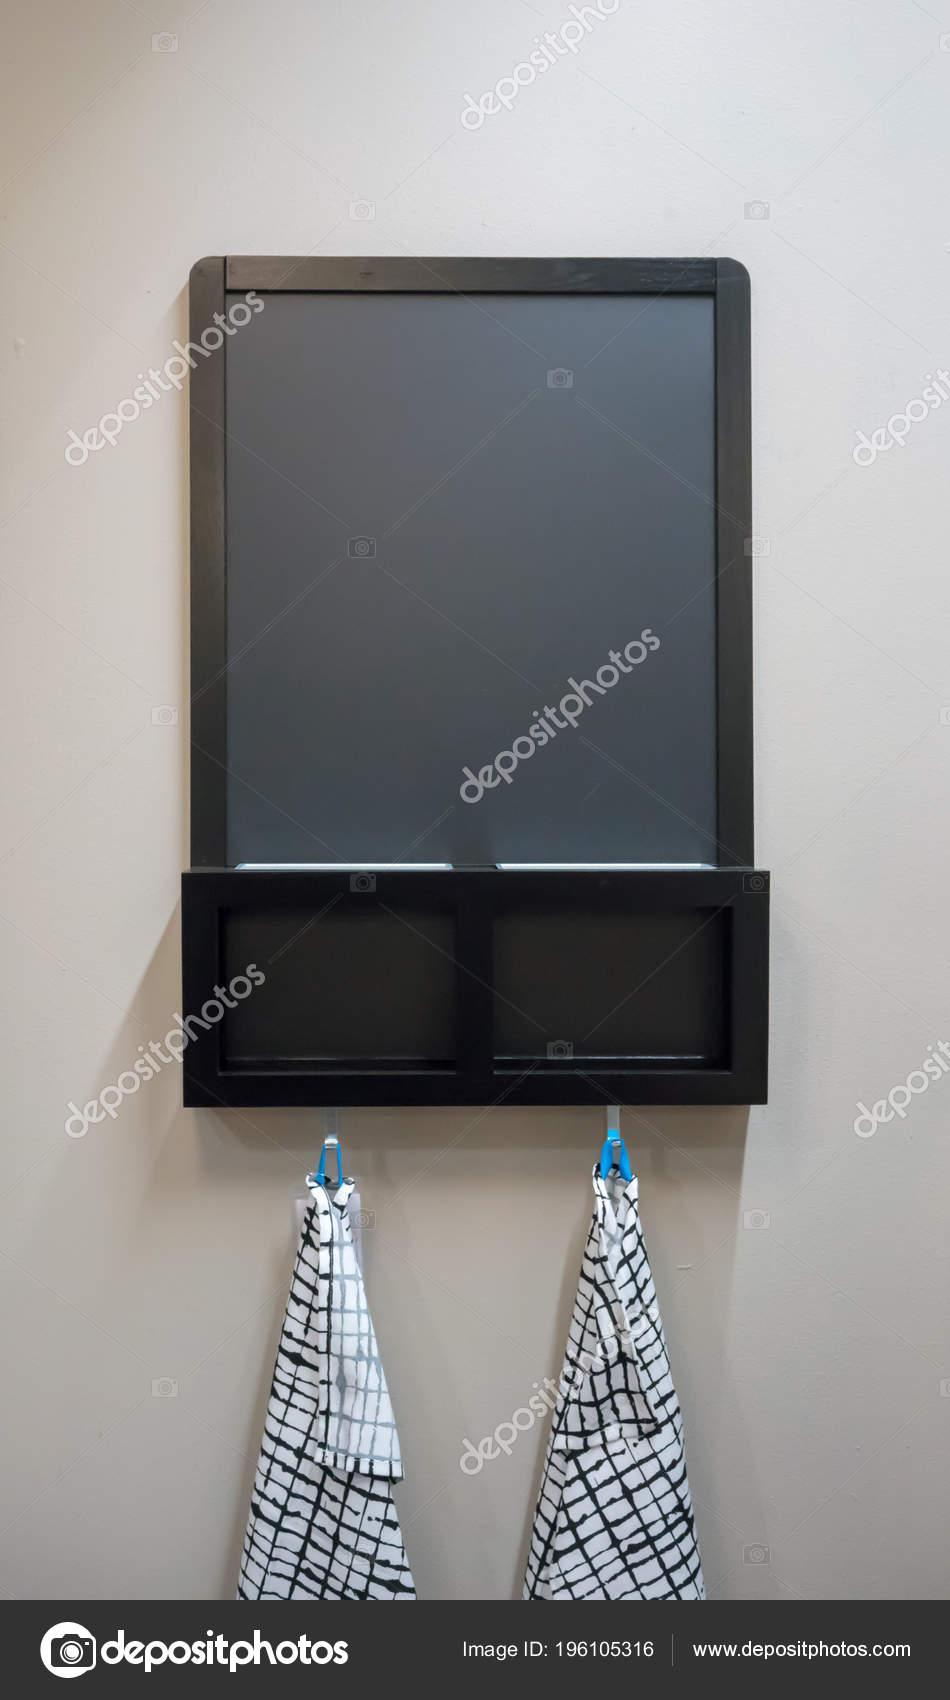 kitchen window valance can i paint my cabinets 木制黑色粉笔板挂布和墙上存放钩 图库照片 c v74 196105316